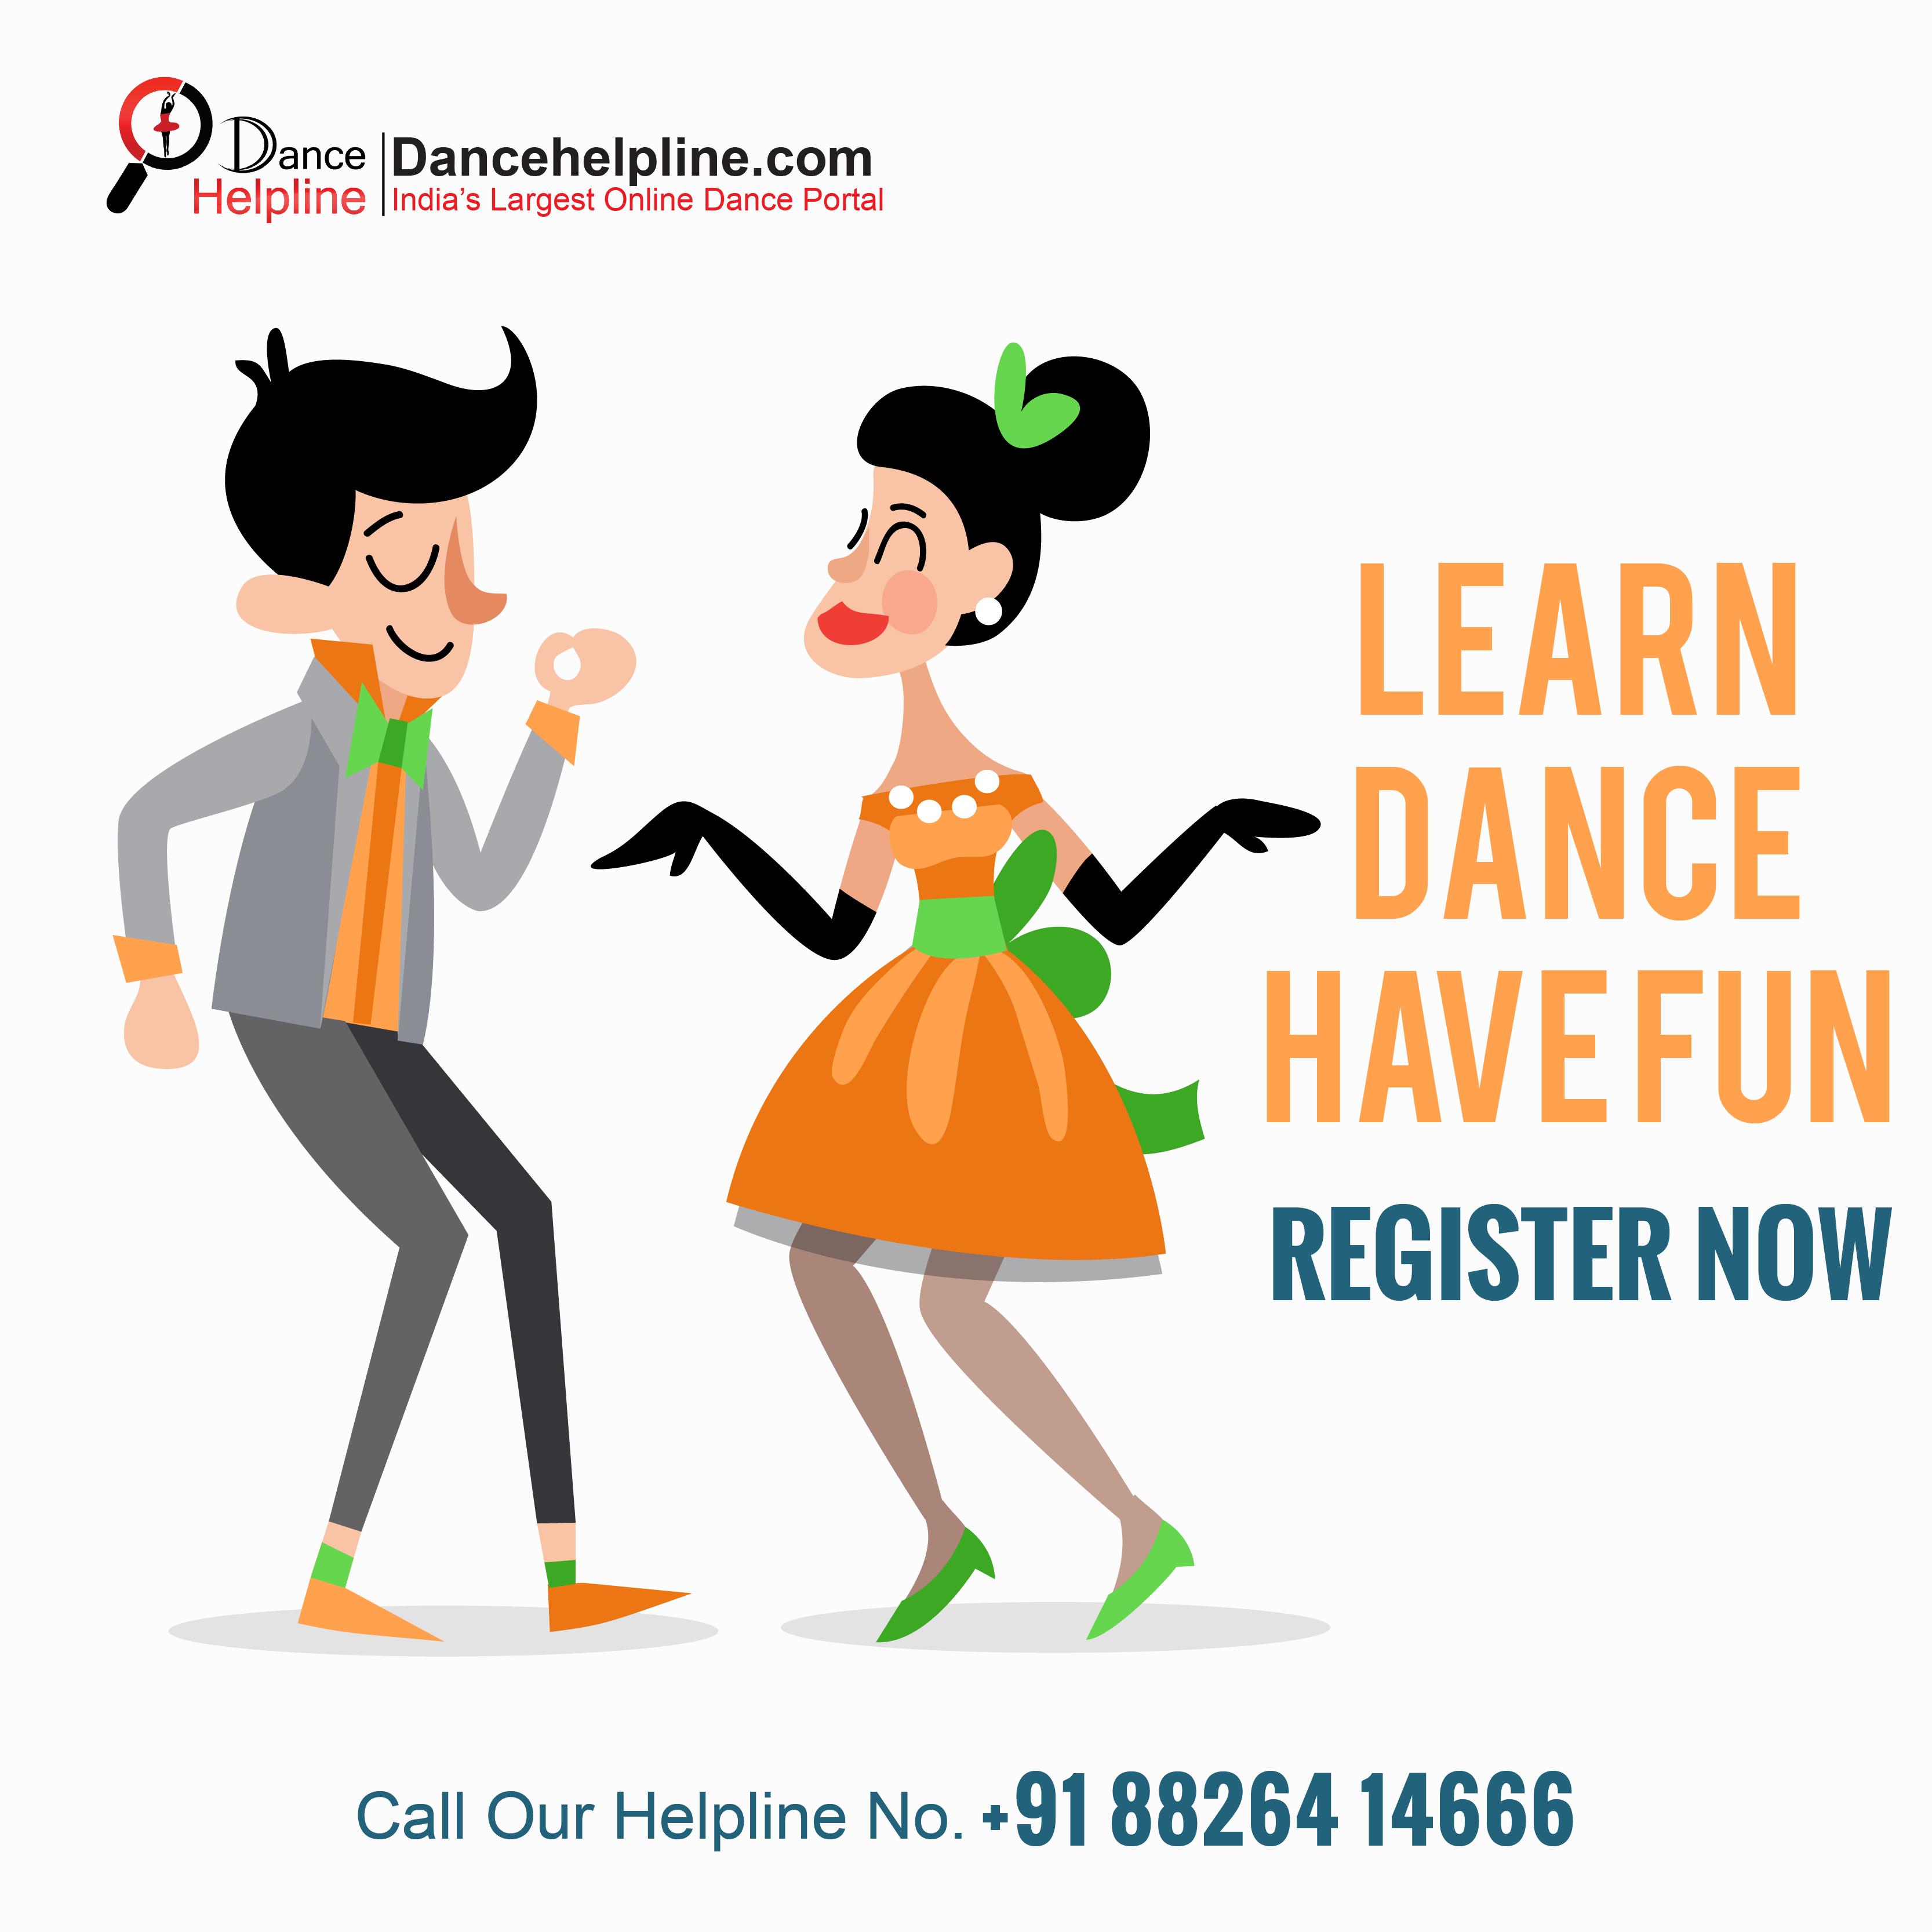 Get To Dance Class Address Near Your Location Dance Class Couple Dancing Dance